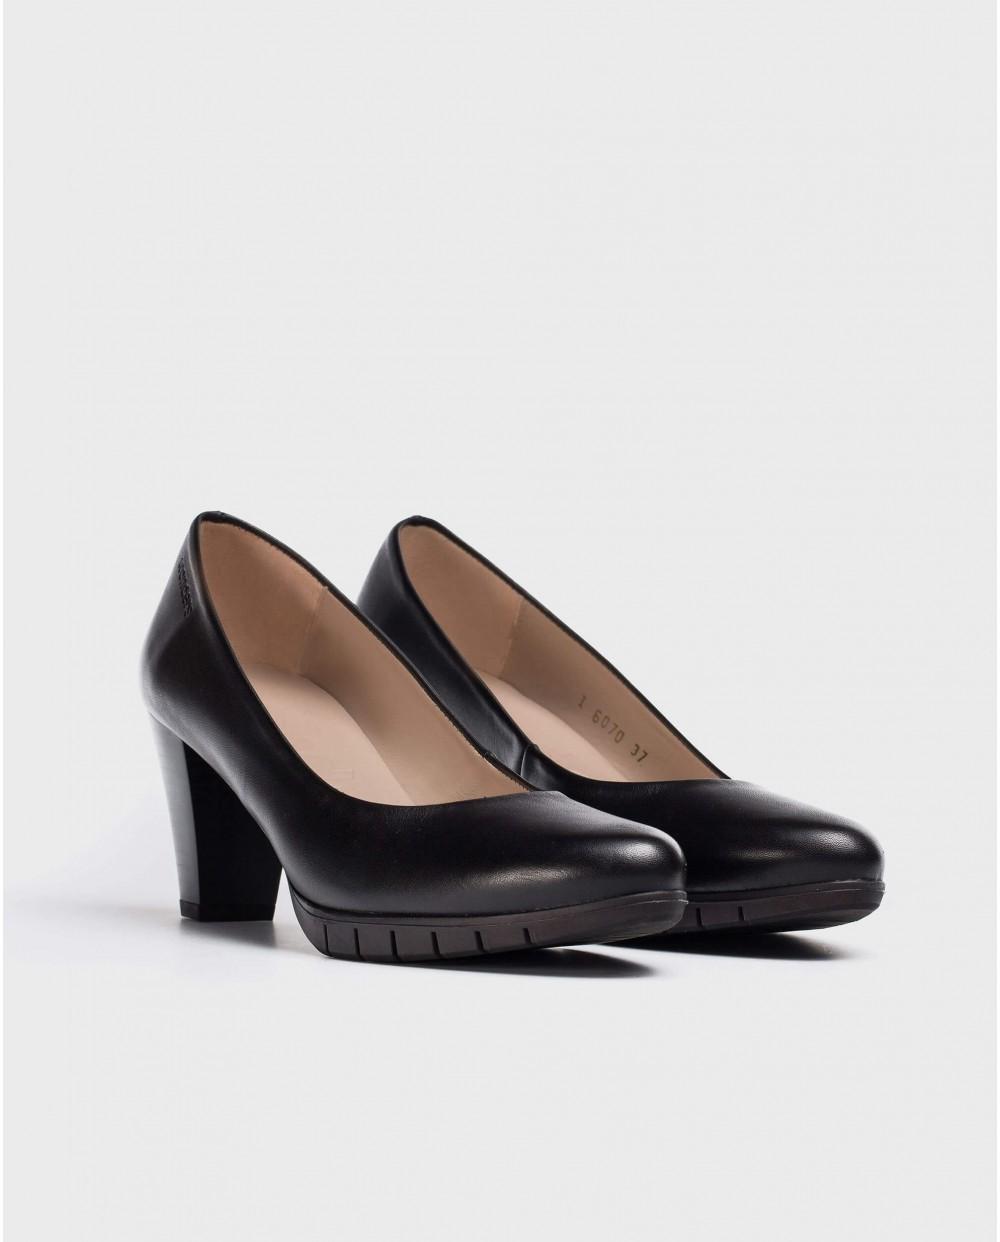 Wonders-Outlet-High heeled shoe